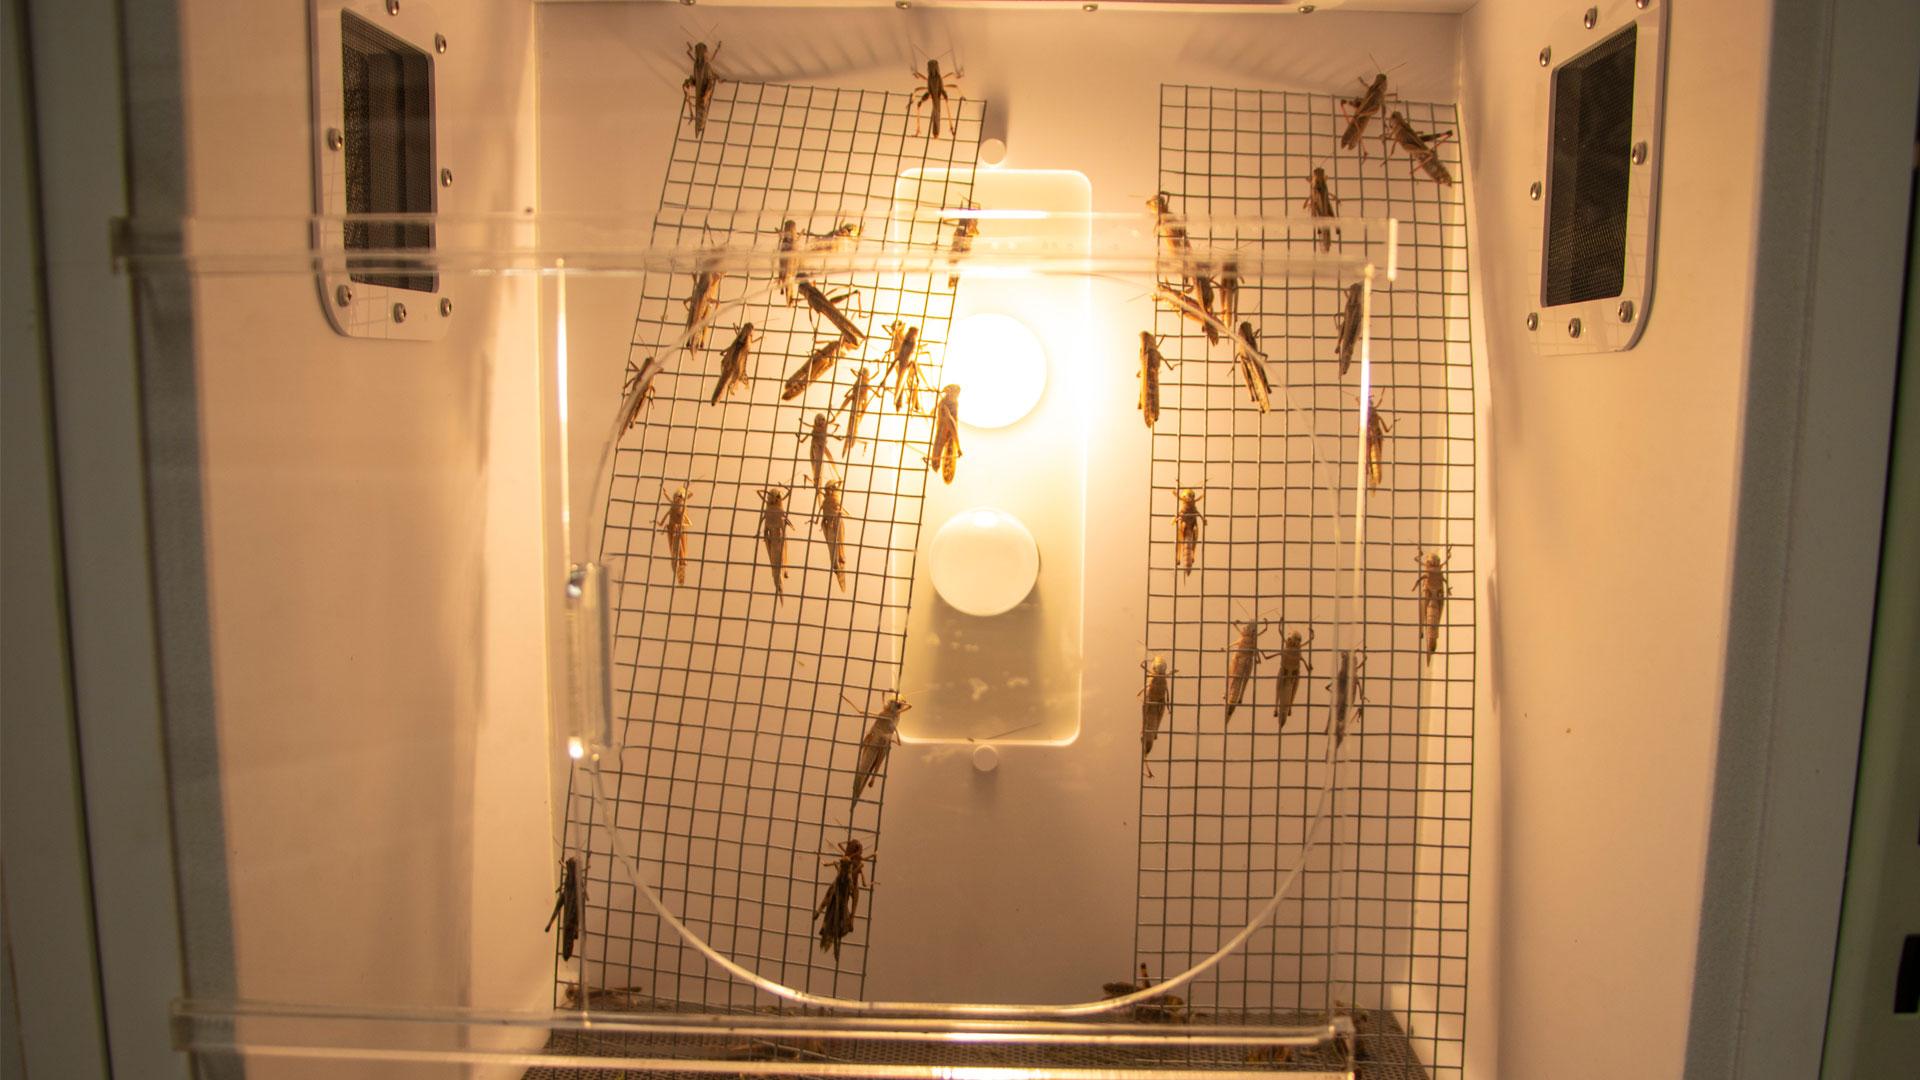 https://rfacdn.nz/zoo/assets/media/insect-portacom-gallery-10.jpg